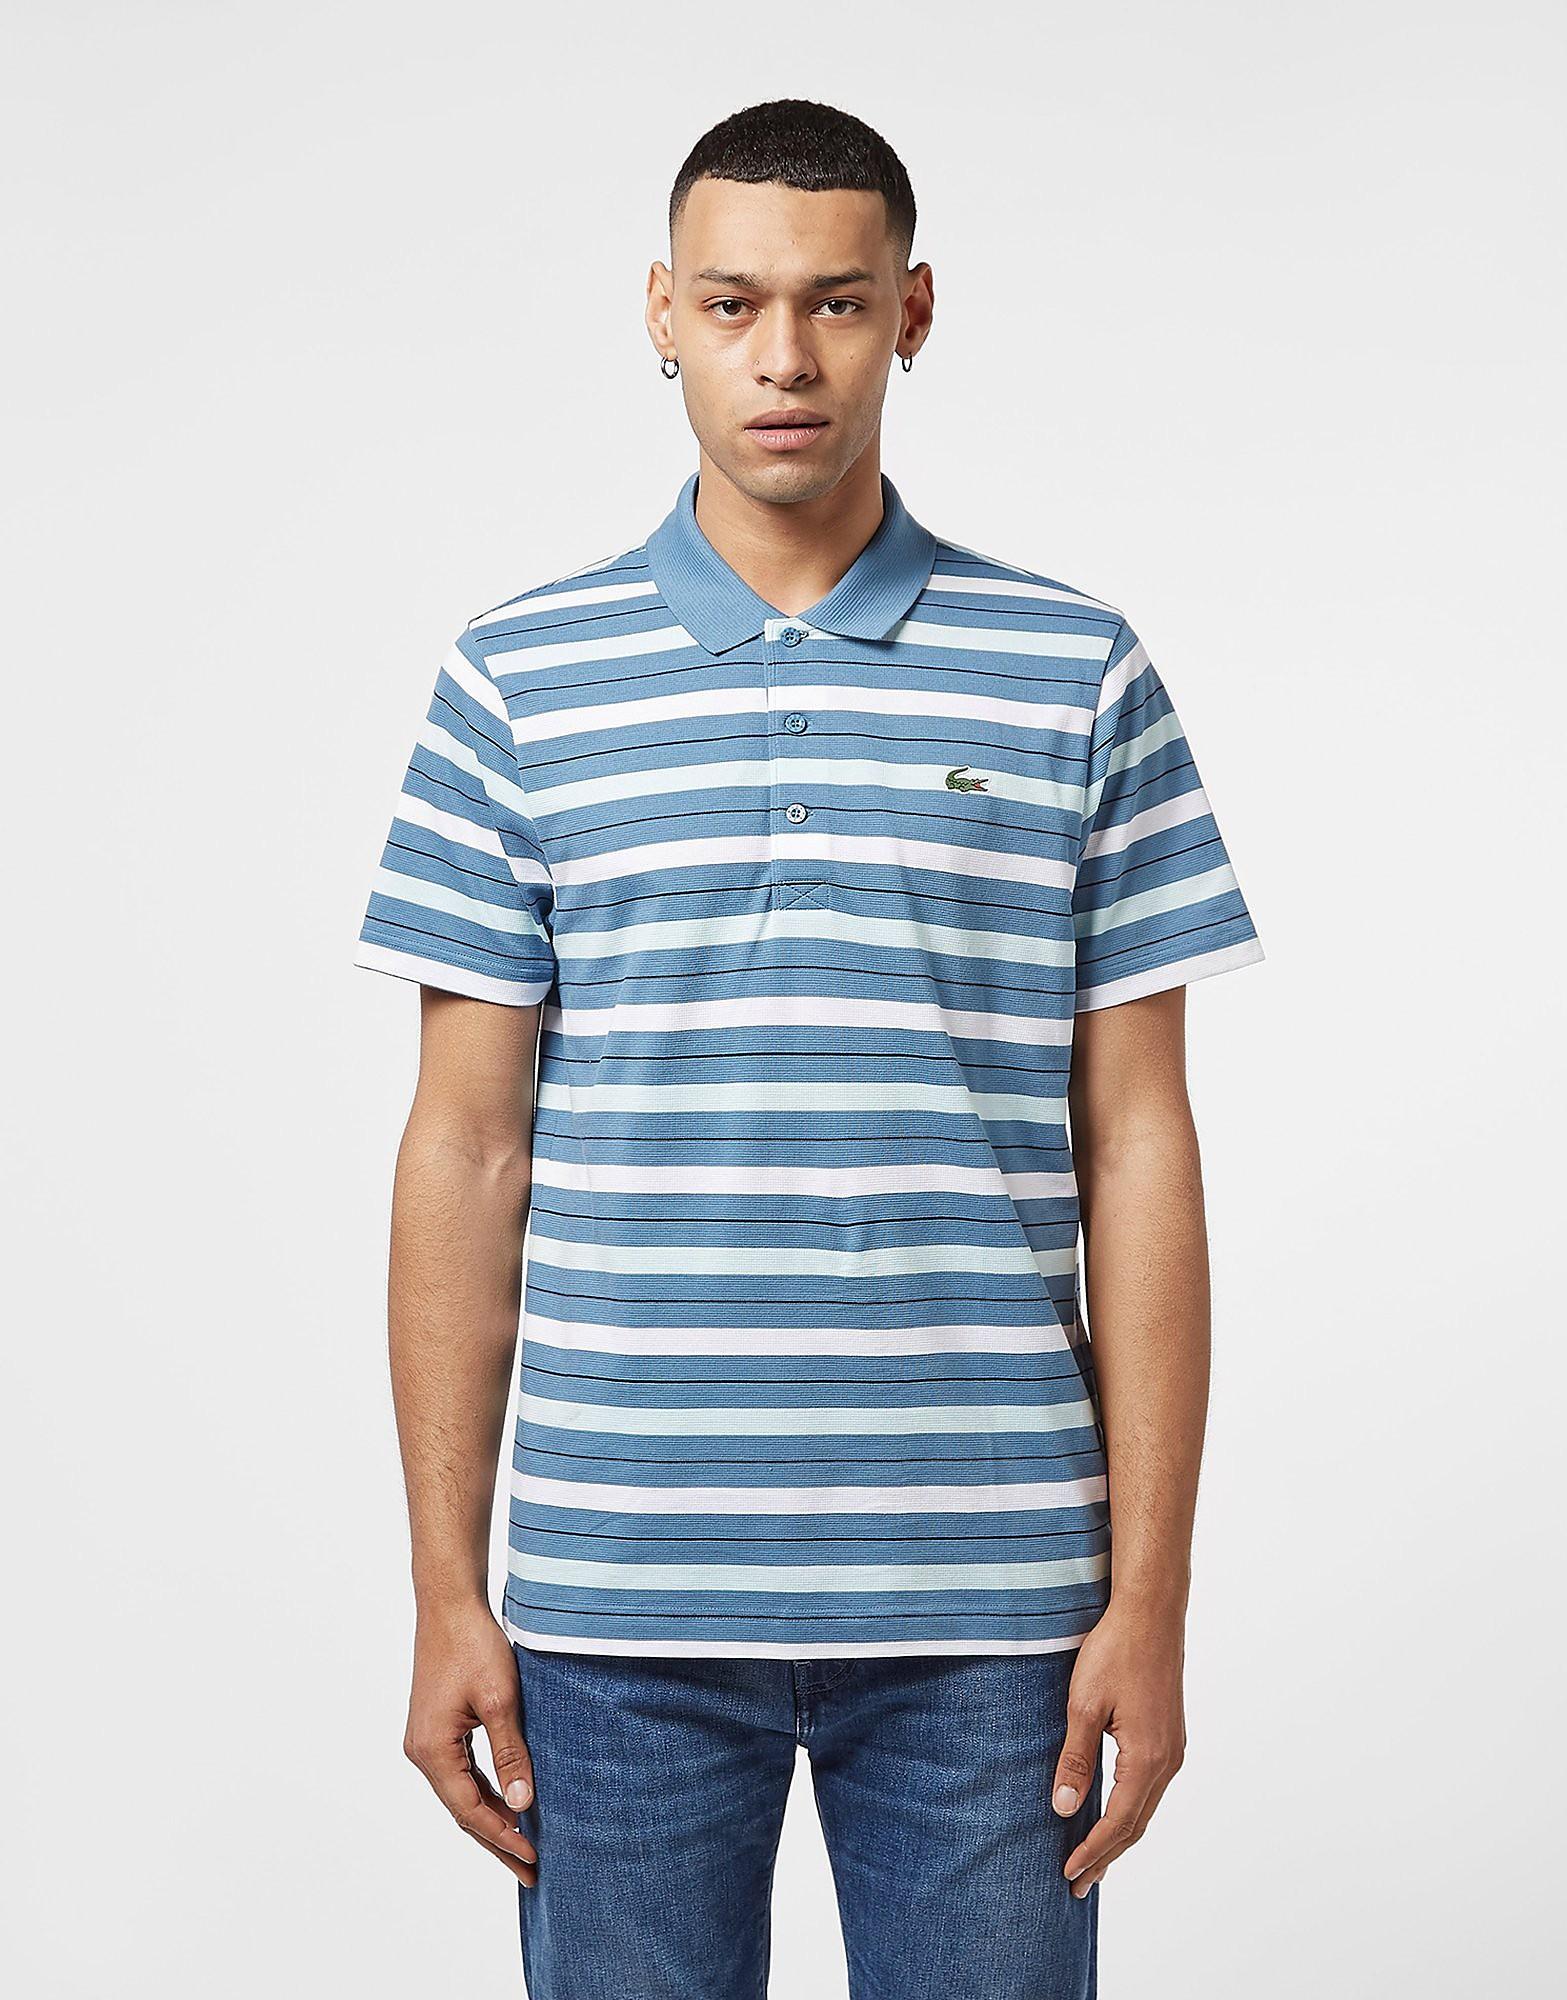 Lacoste Short Sleeve Stripe Polo Shirt